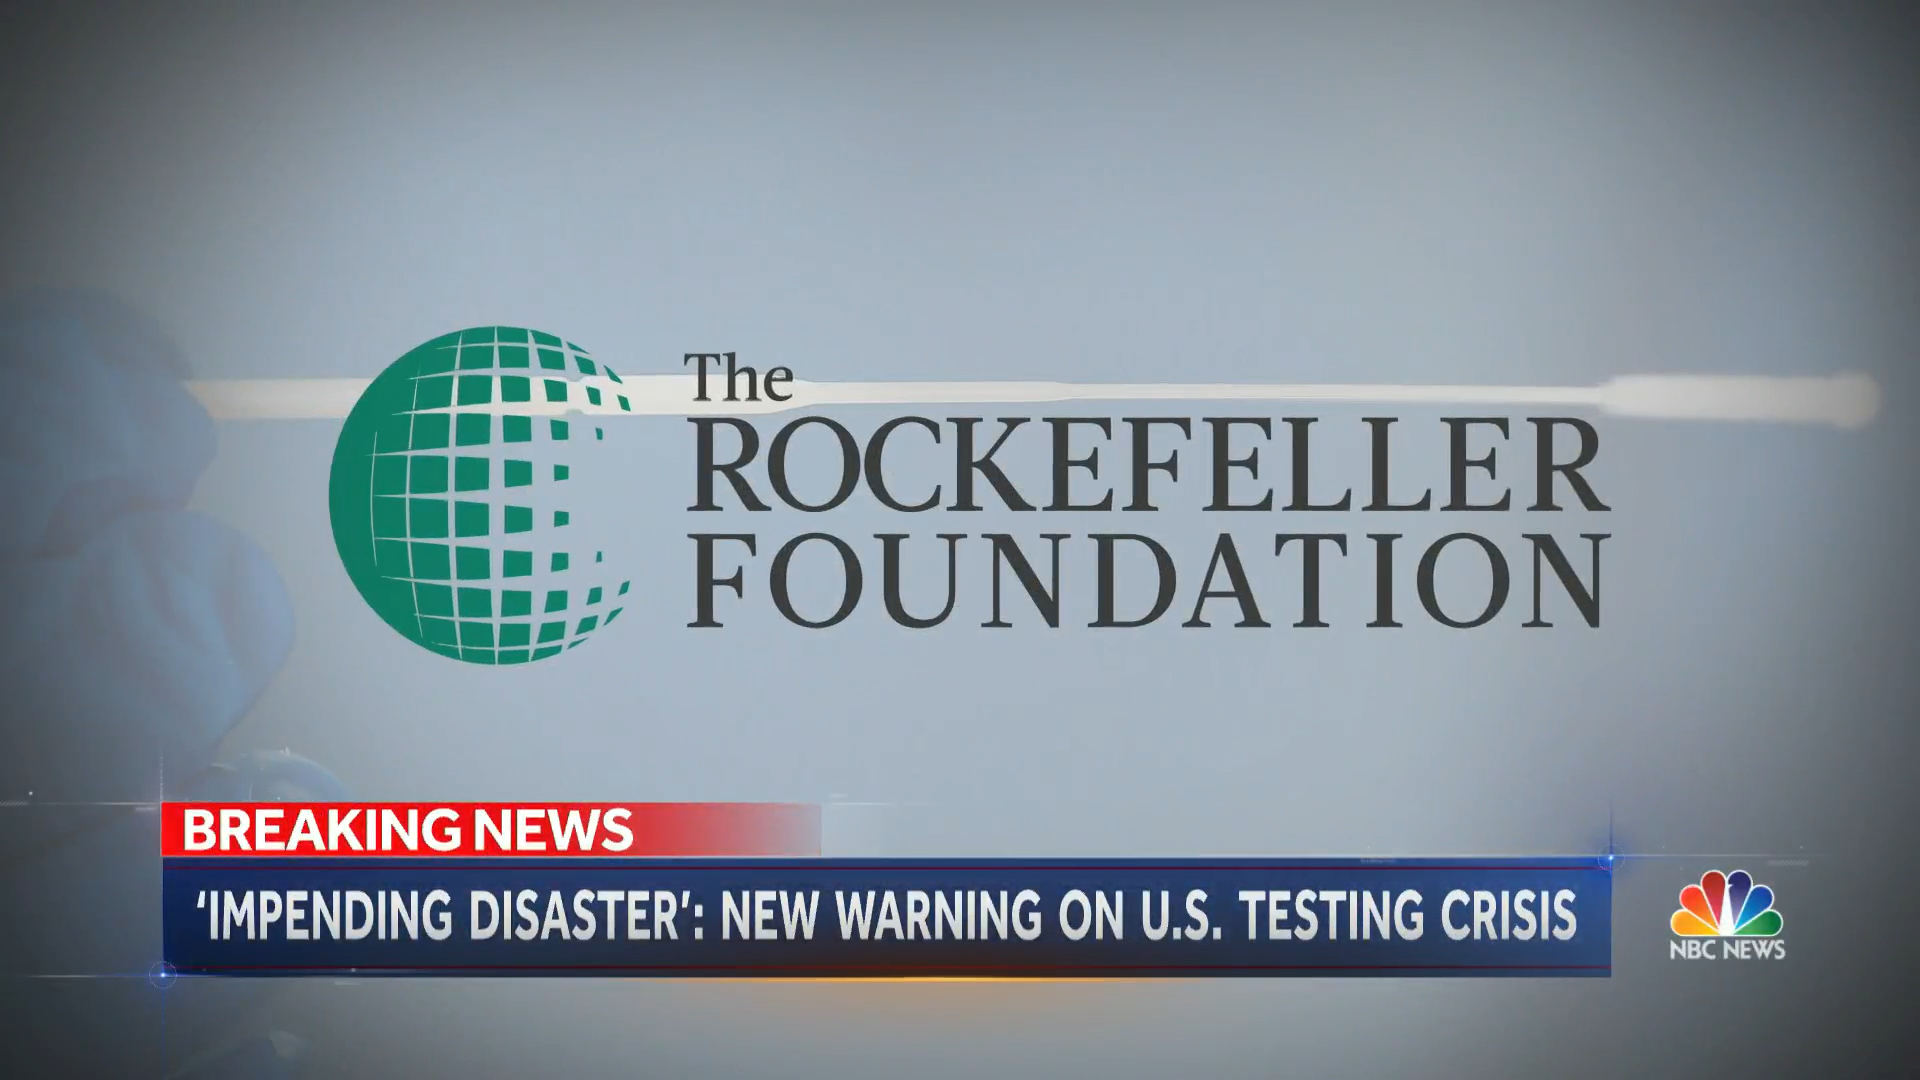 Nbc Nightly News The Rockefeller Foundation